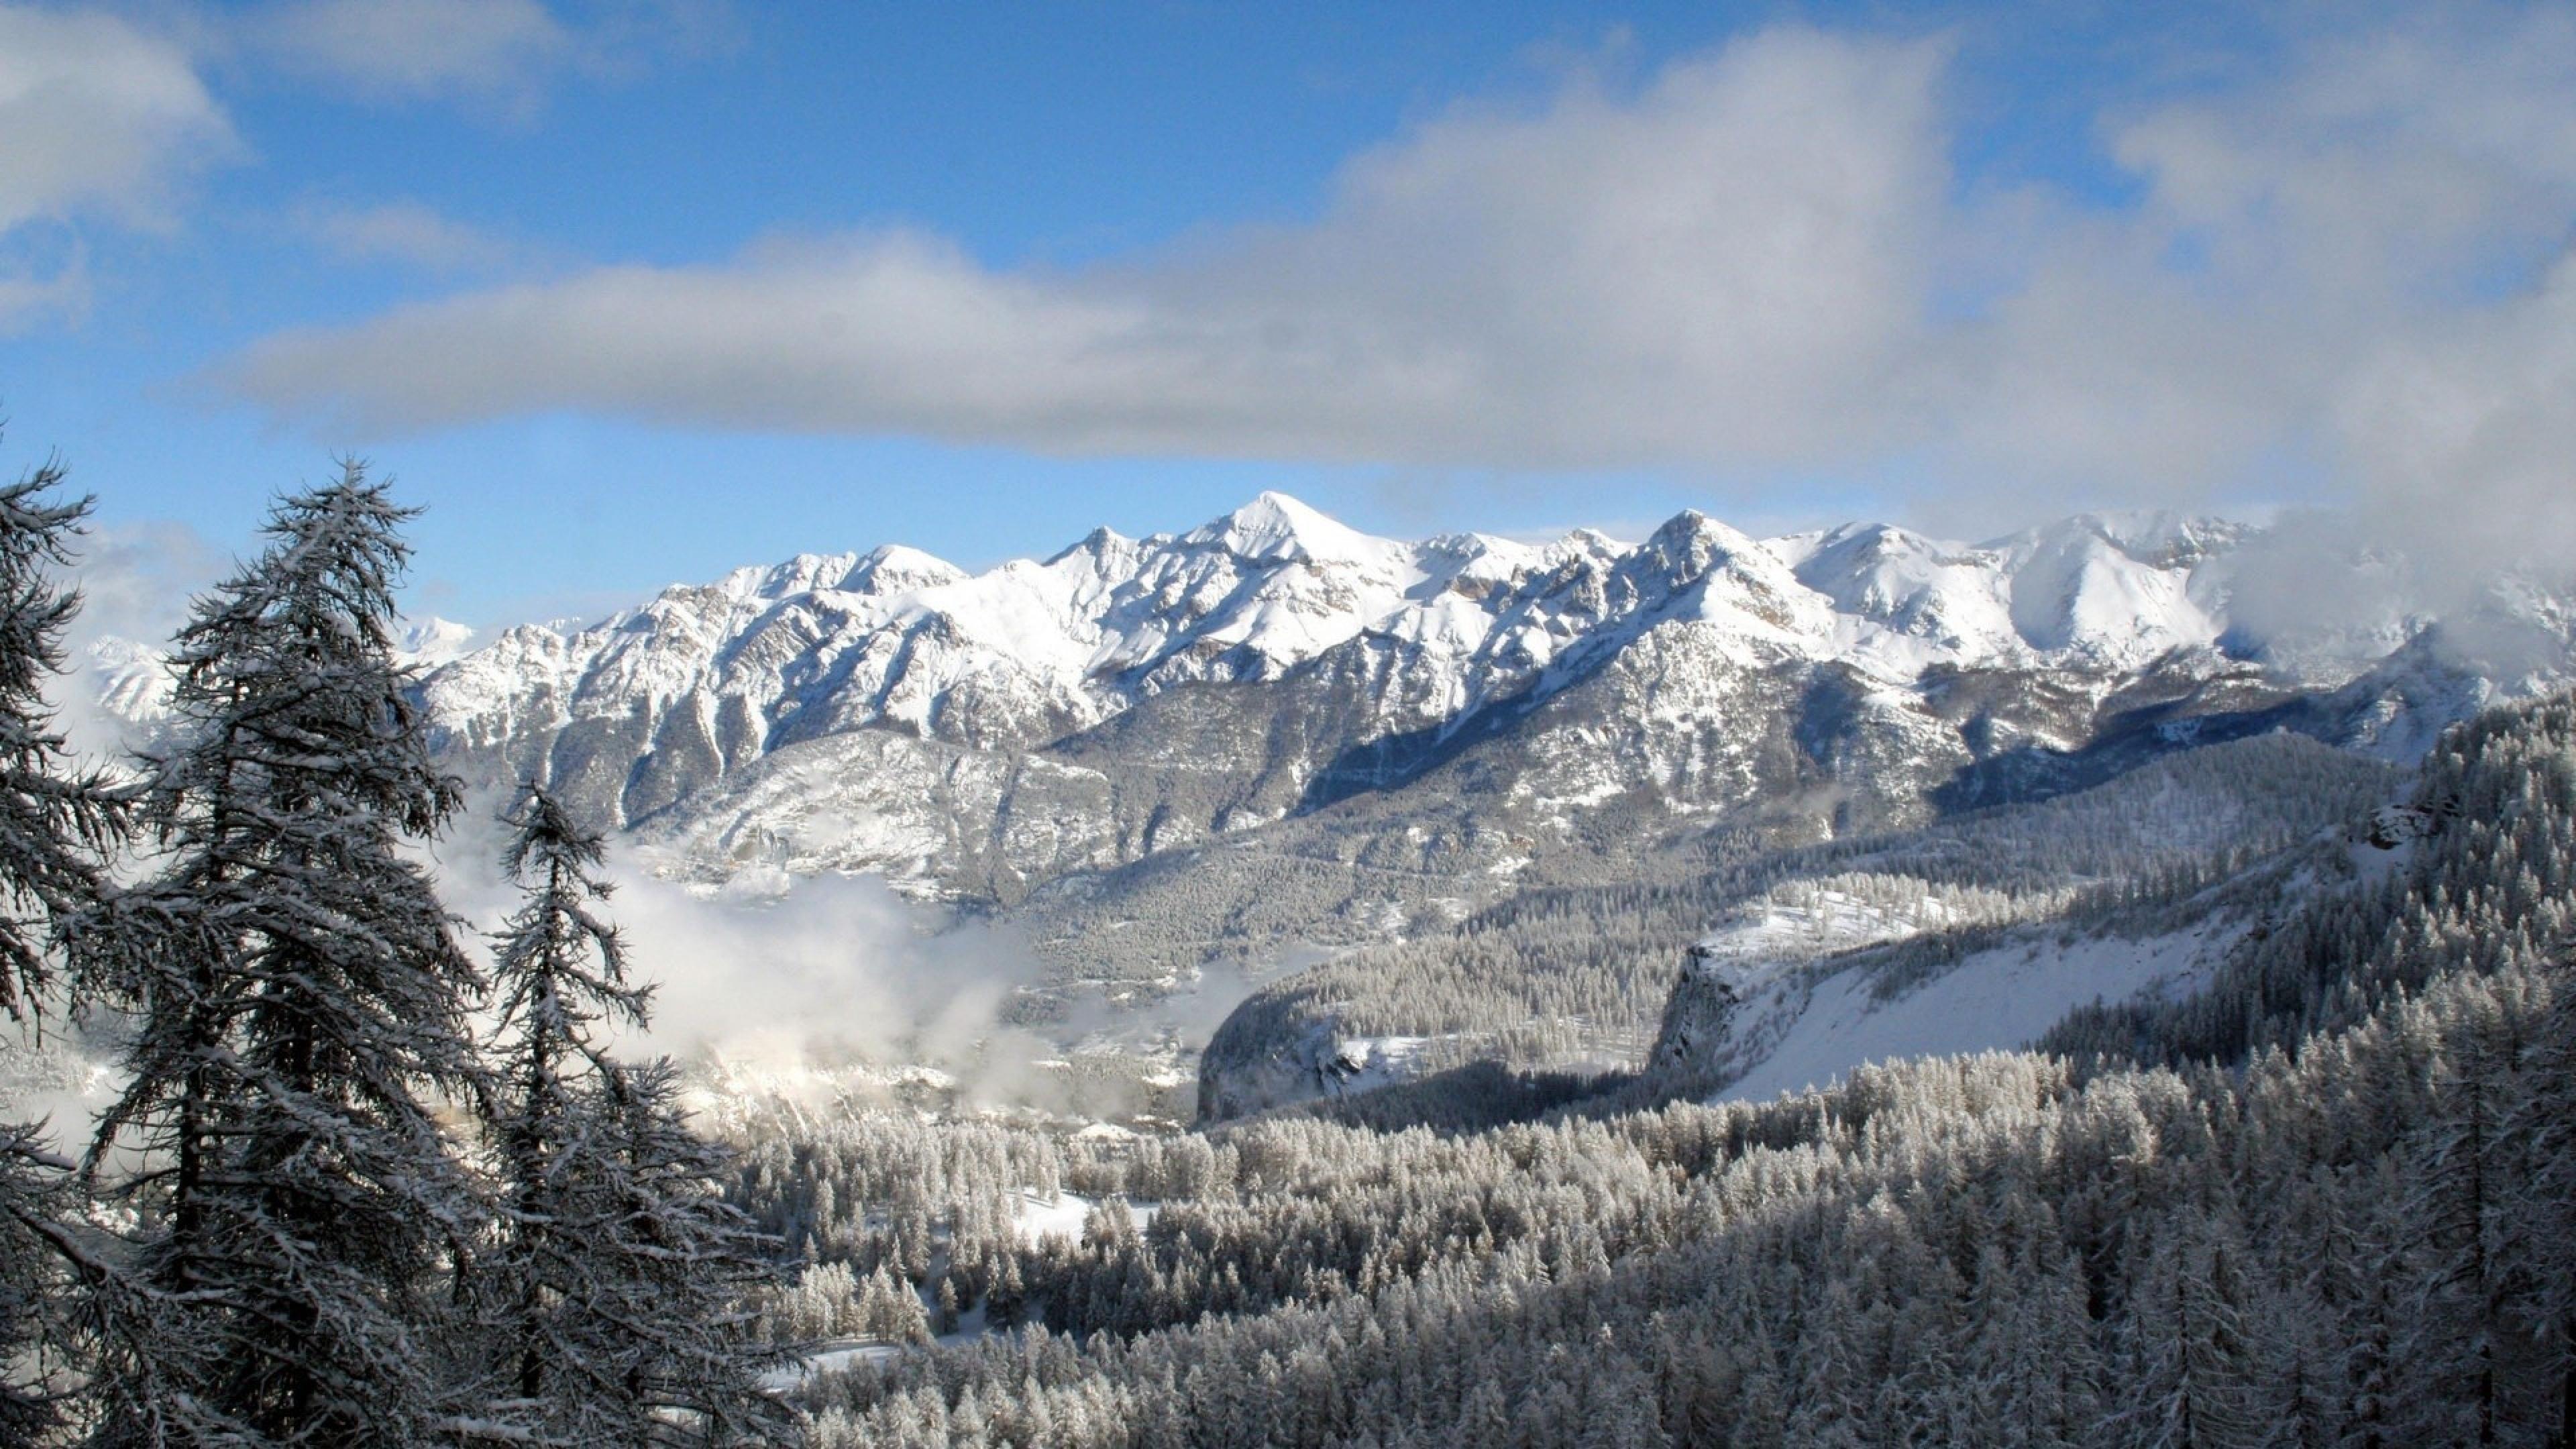 Winter Mountains Desktop